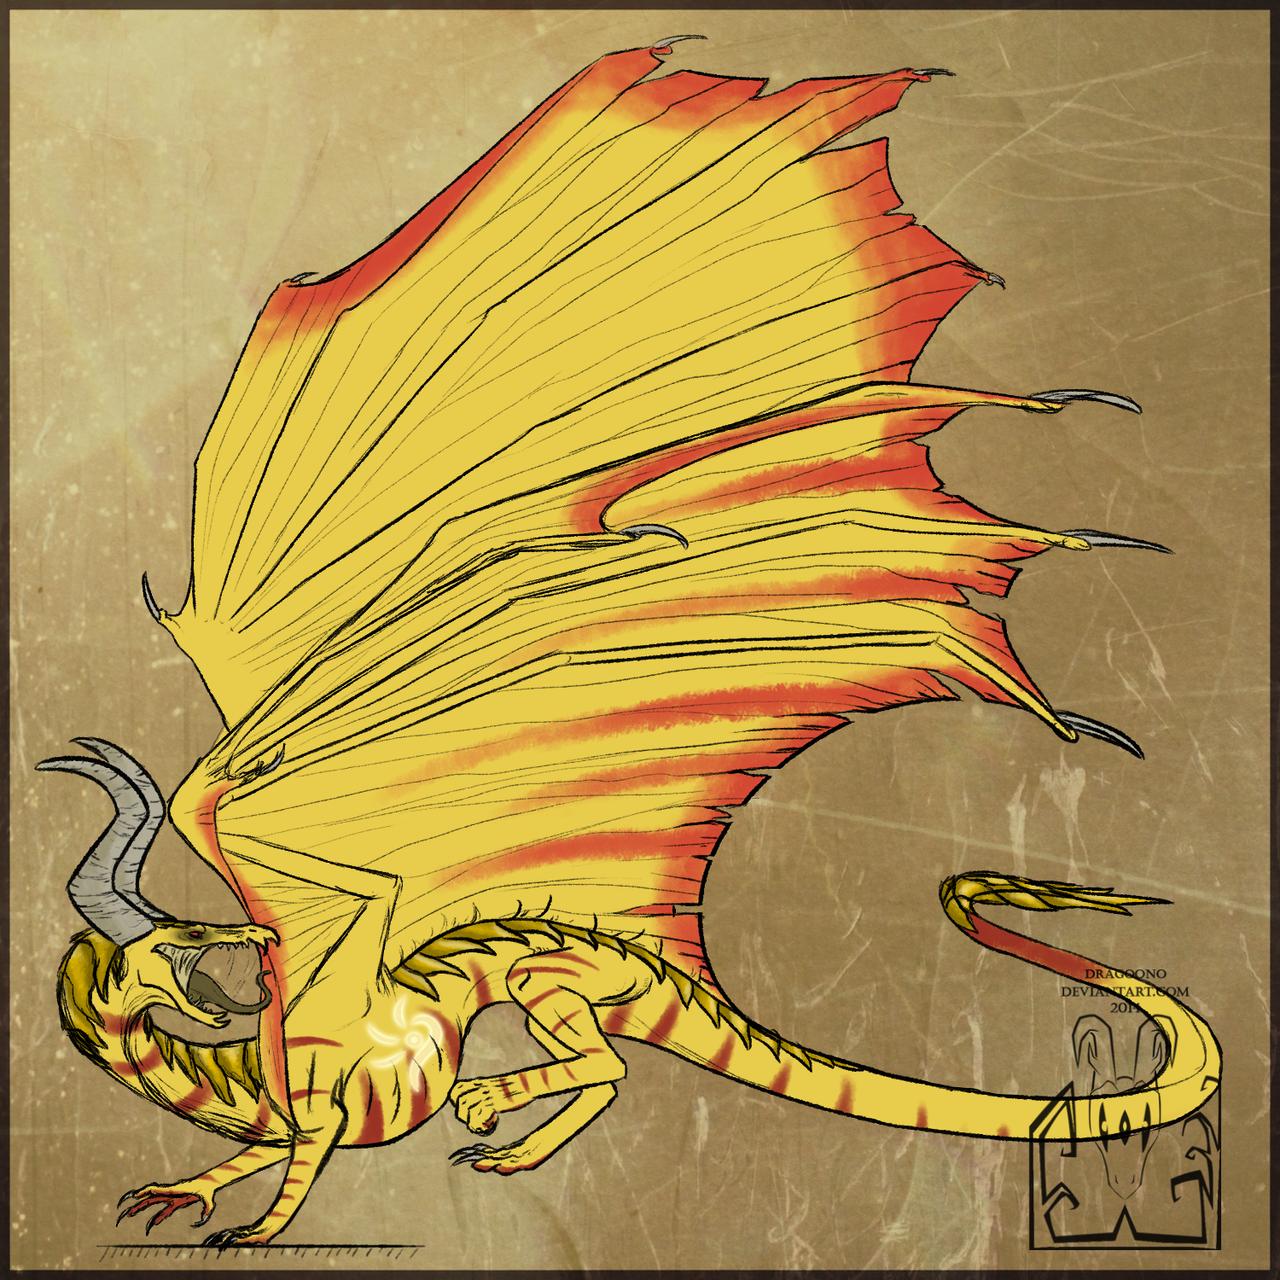 Desert dragon by Virensere